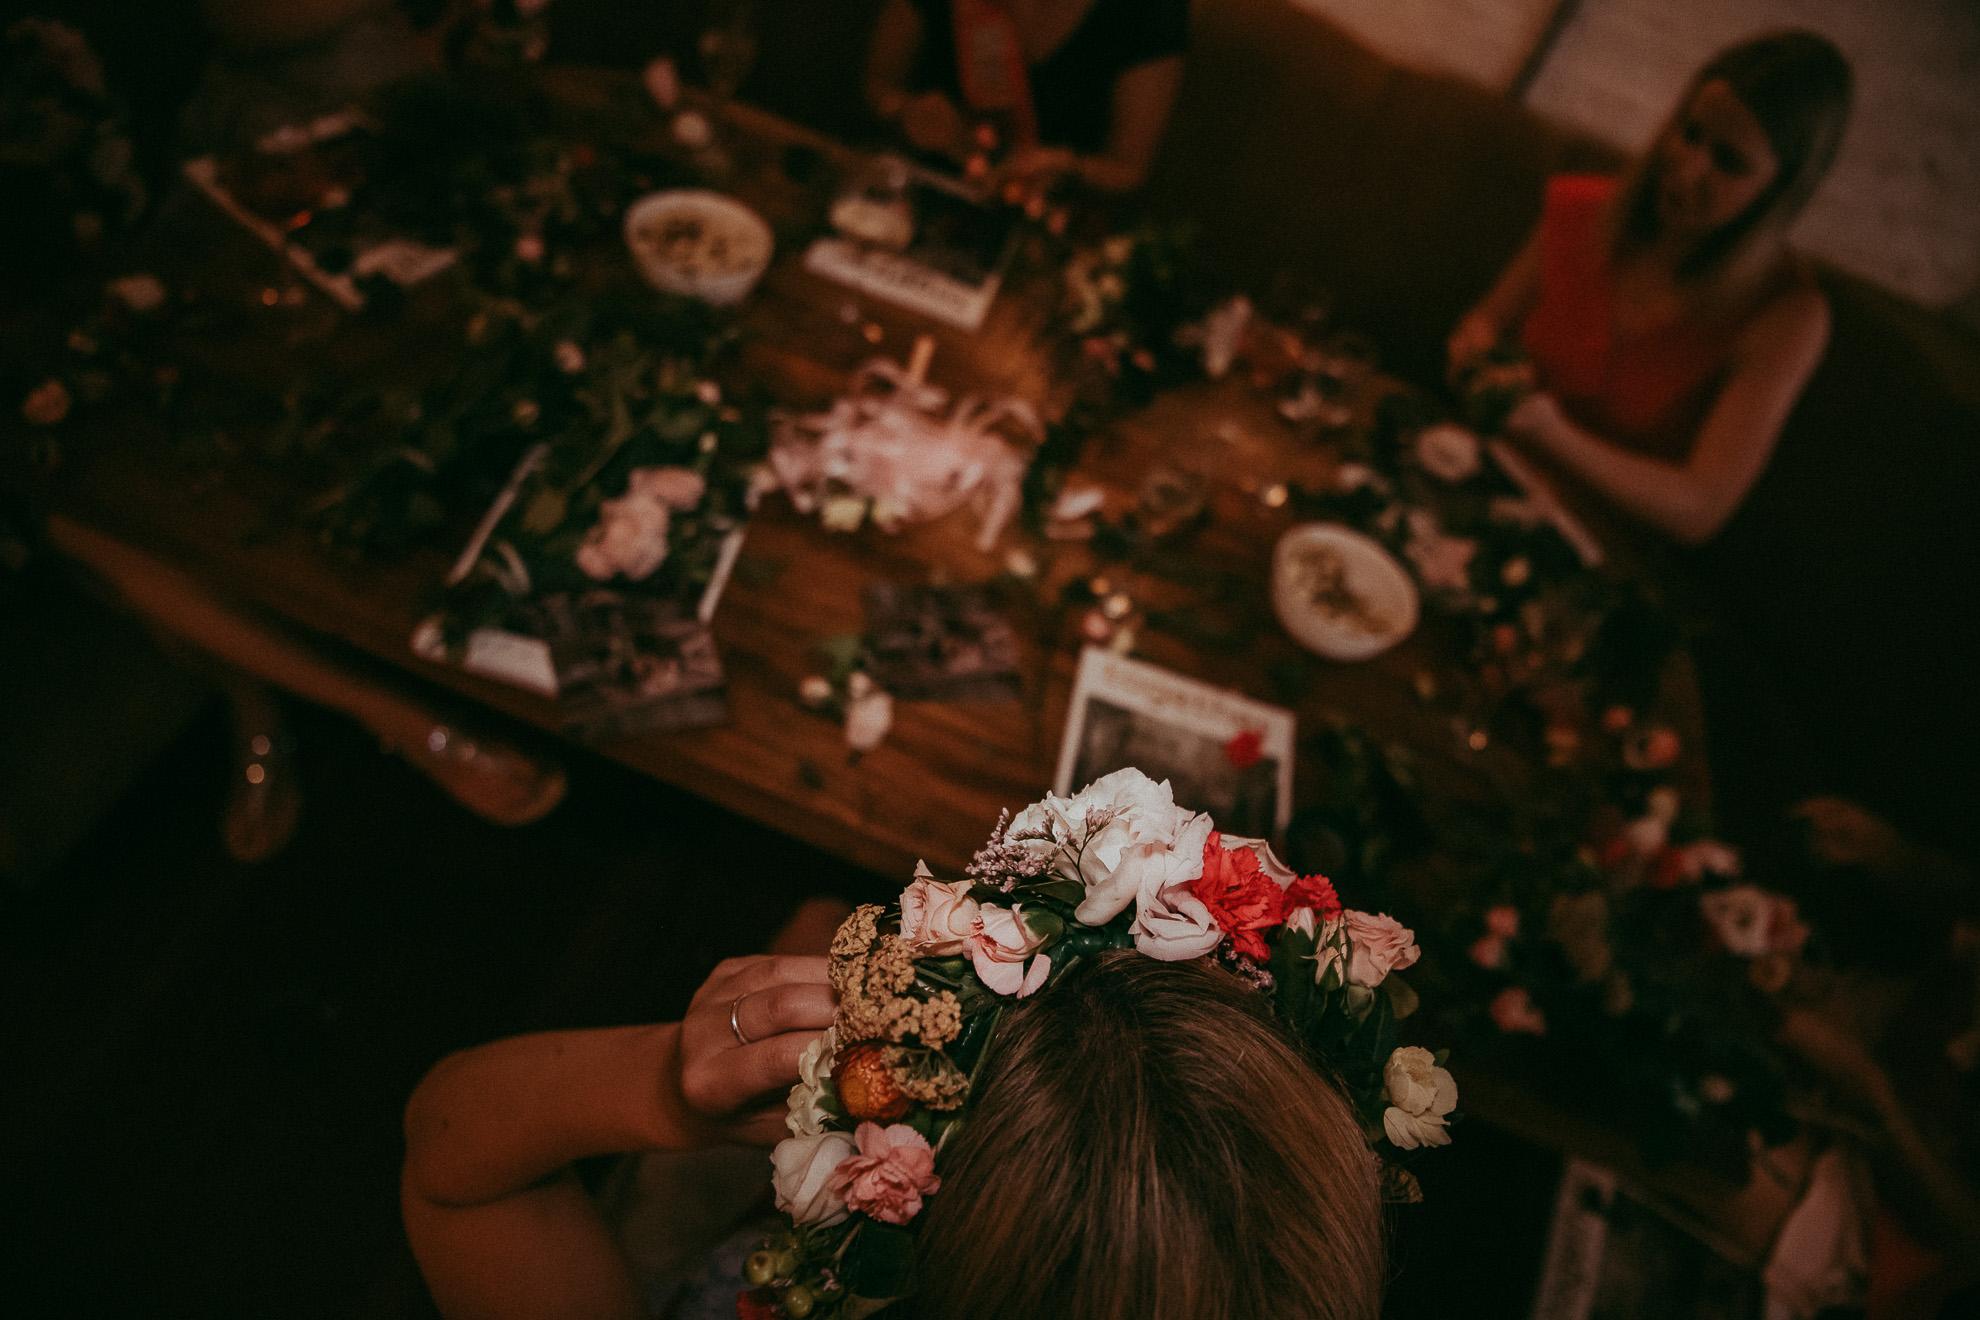 flower-workshop-by-olgalevien-33.jpg